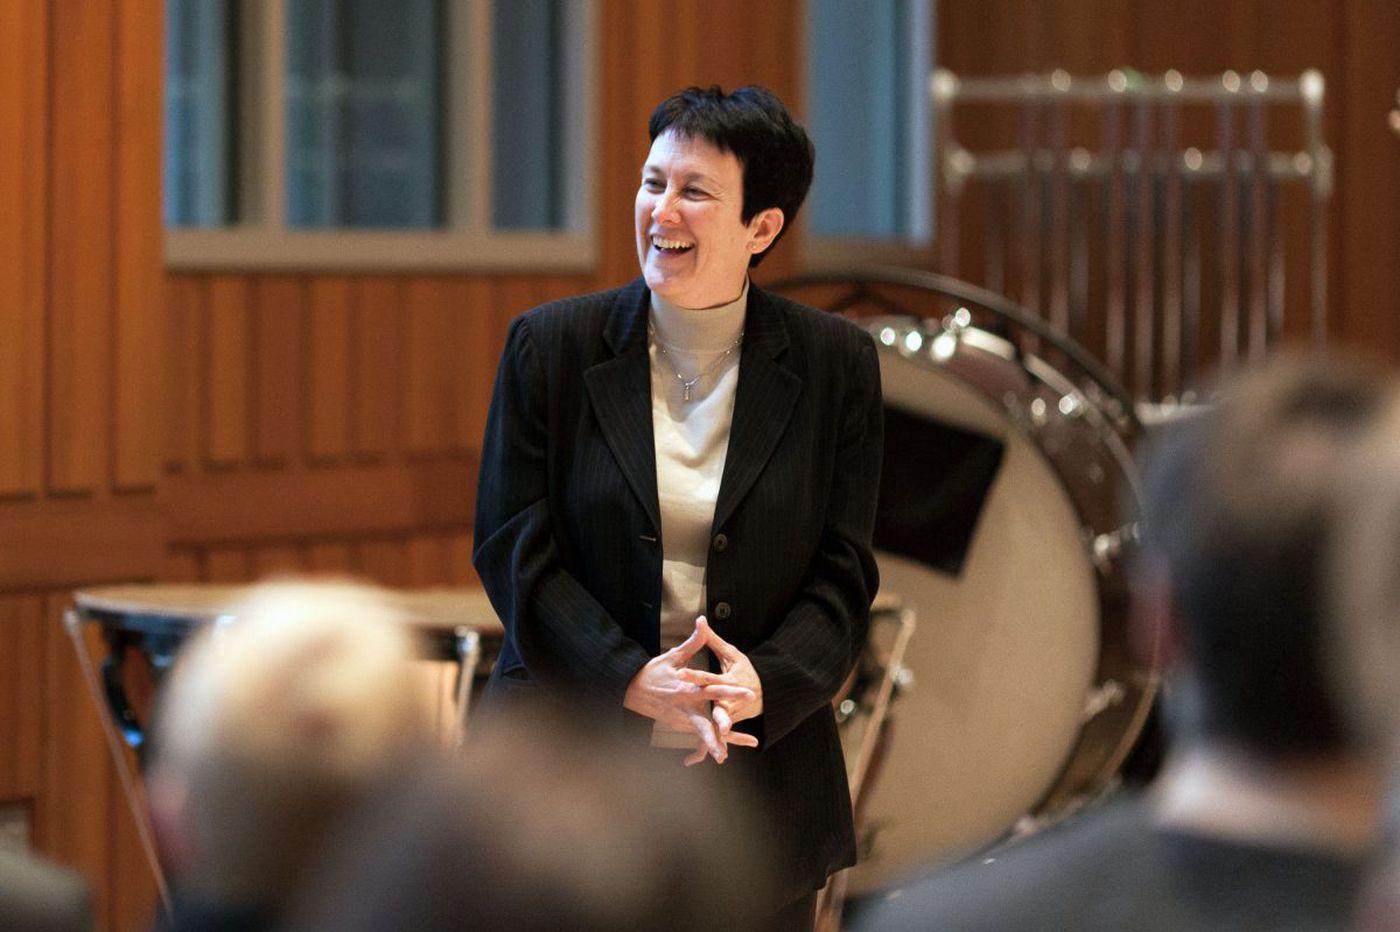 The Philadelphia Orchestra schedule for 2018-19 scores a zero in female composers